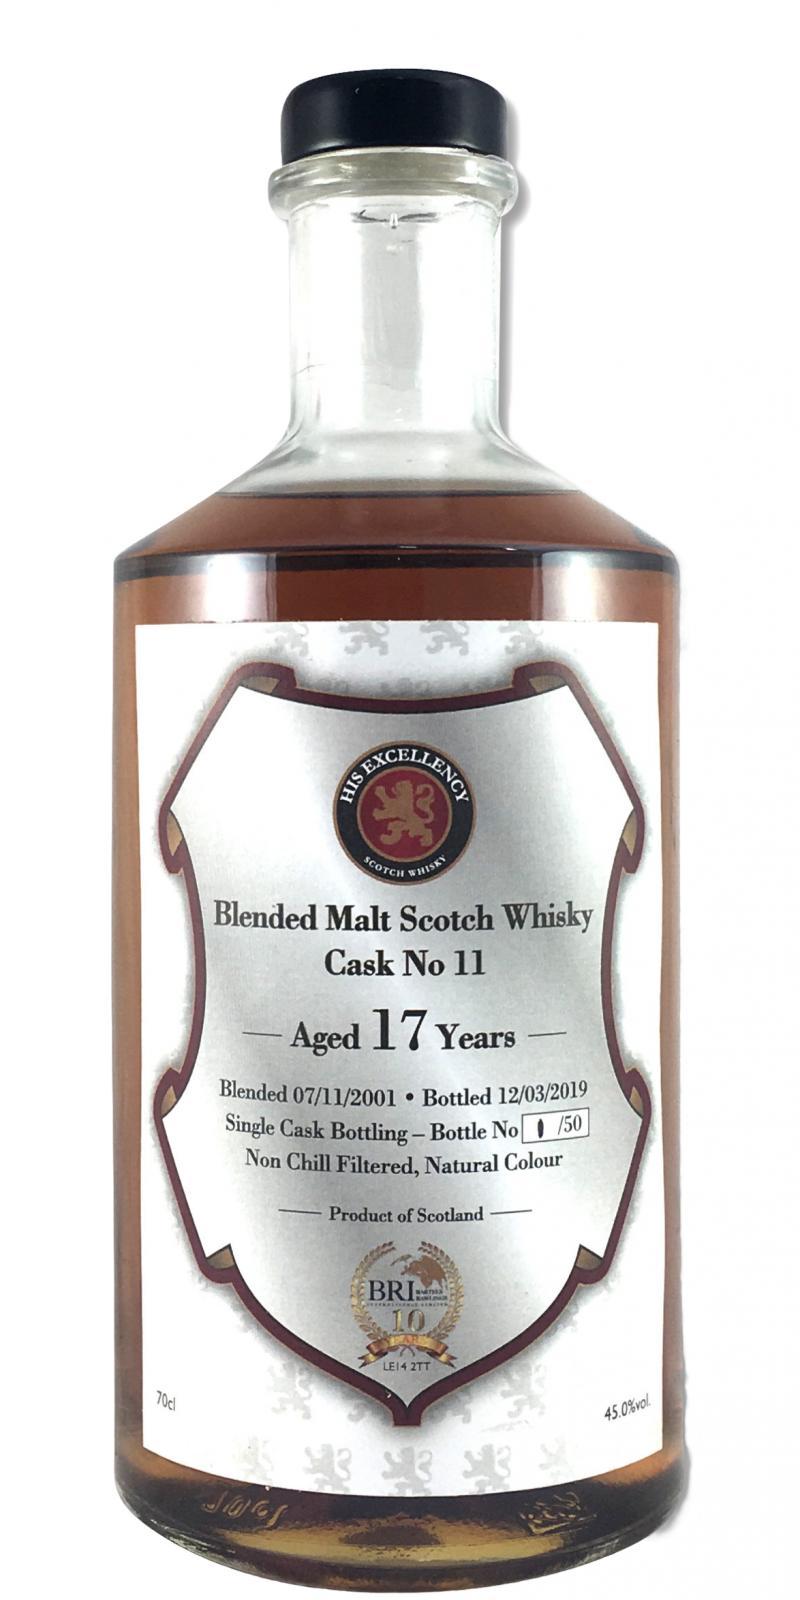 Blended Malt Scotch Whisky 17-year-old